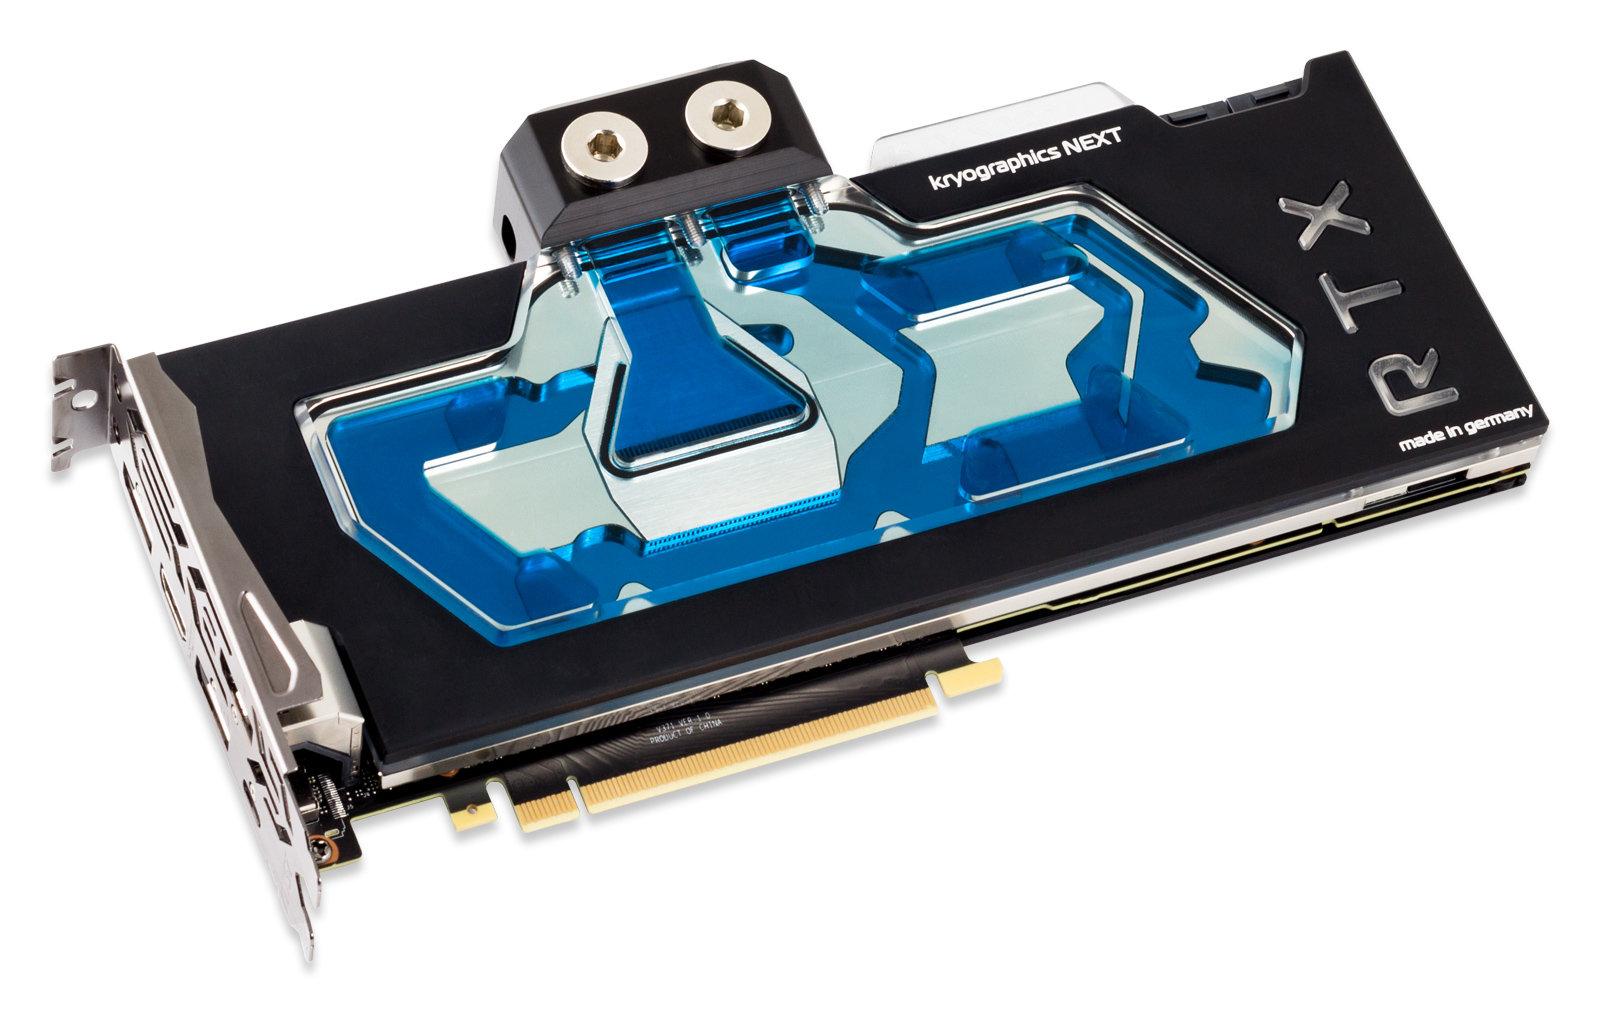 Aqua Computer Kryographics Next RTX 2080 Ti